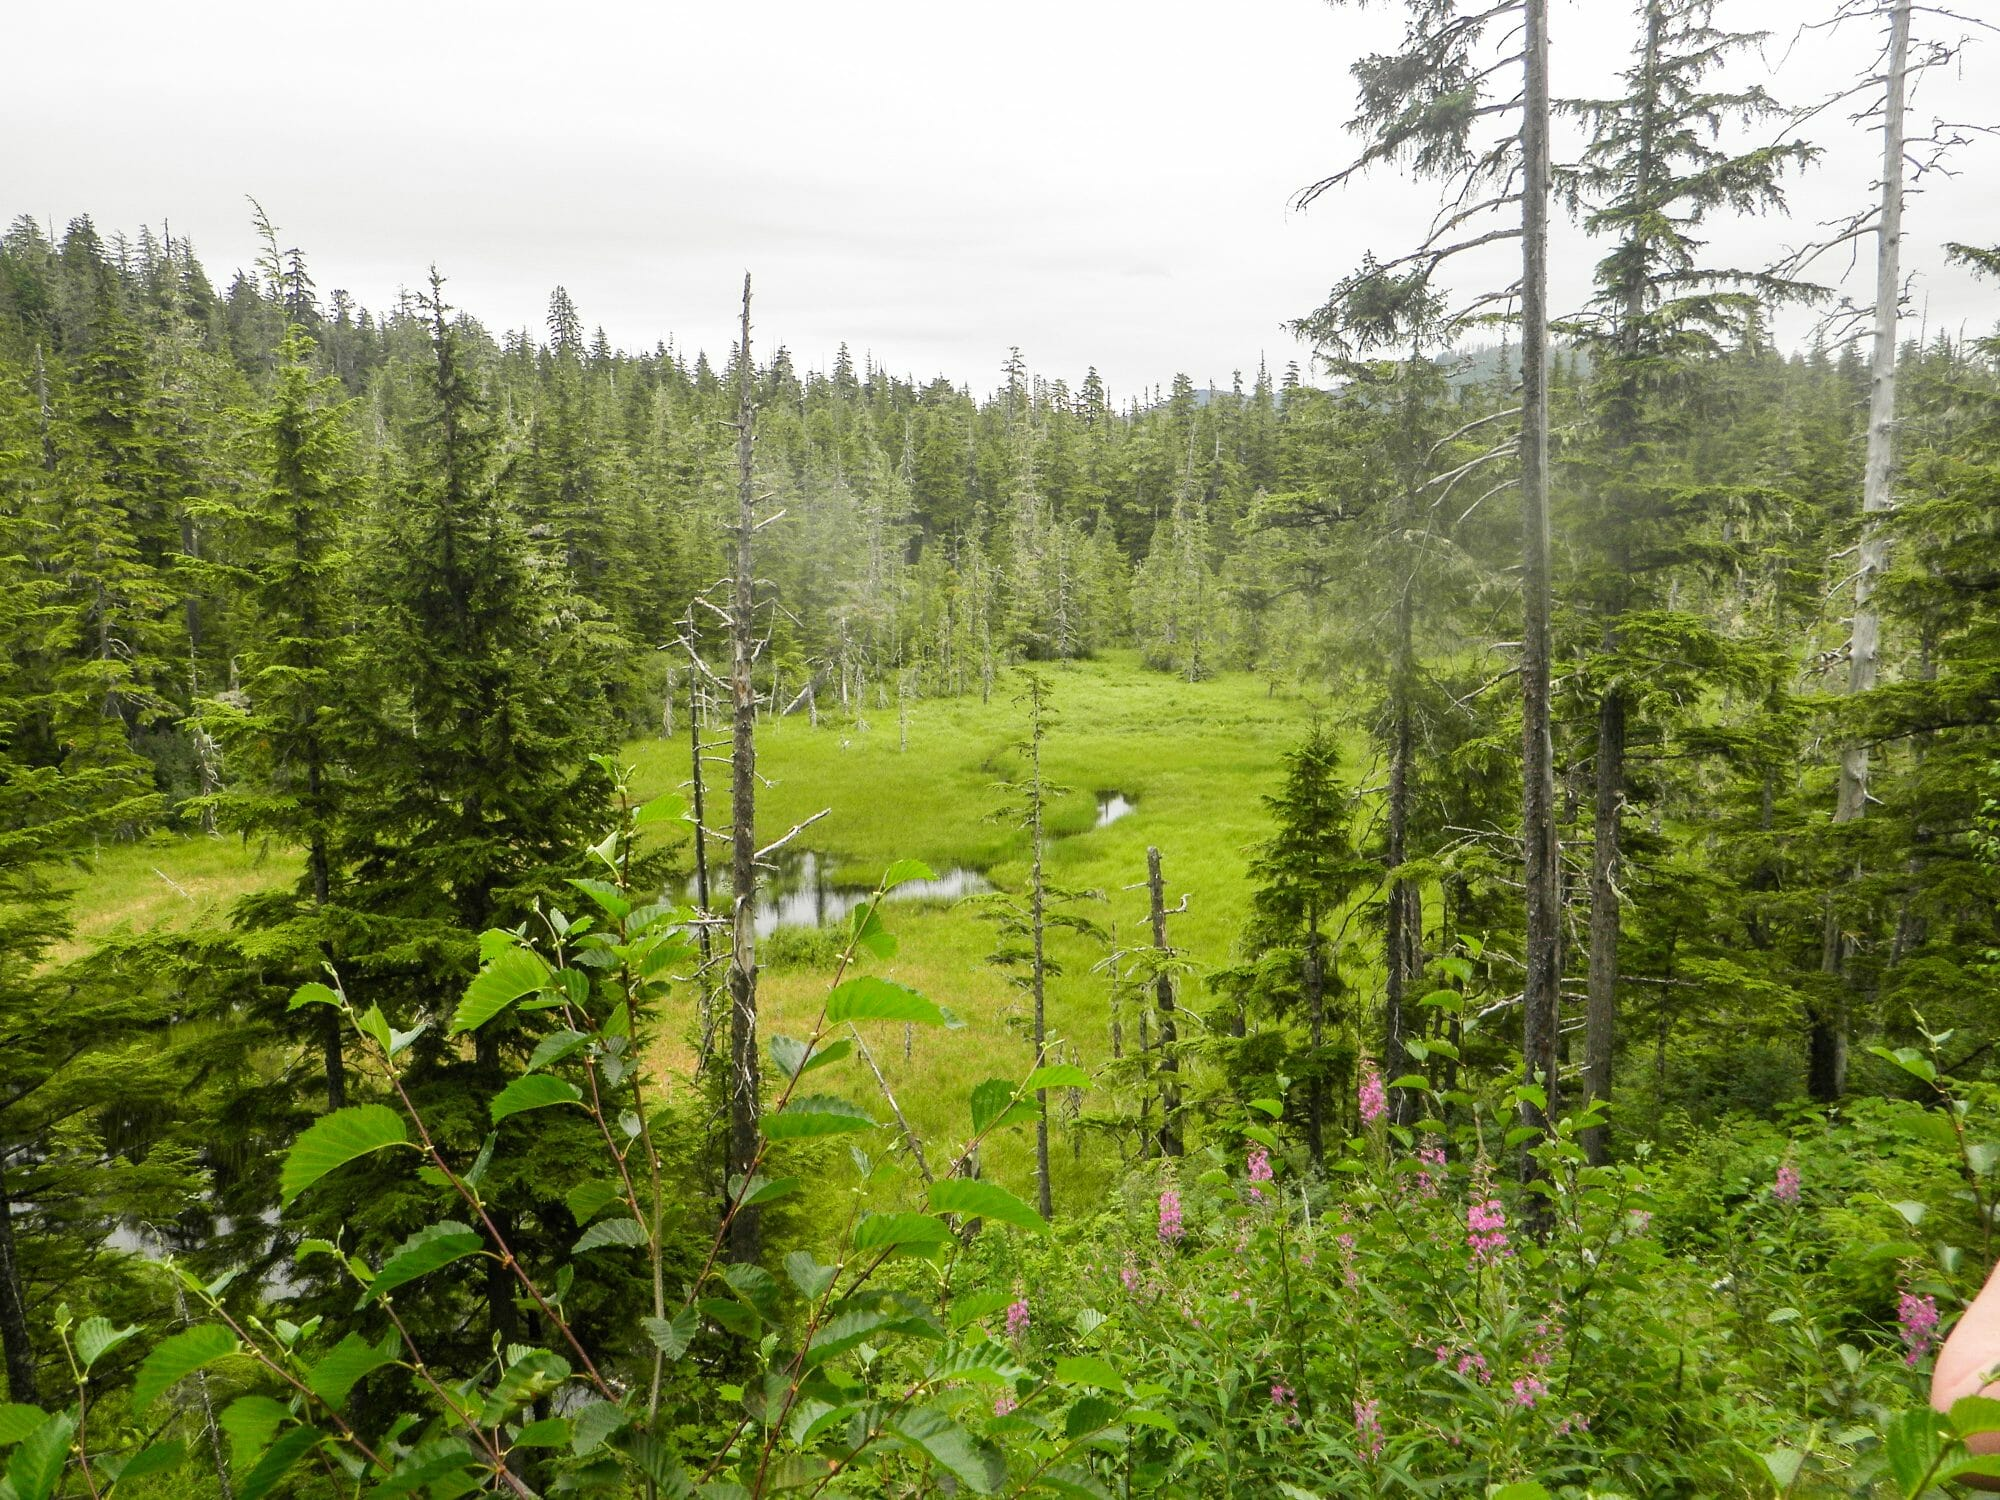 Gunnuk Creek S. - Kake, Alaska